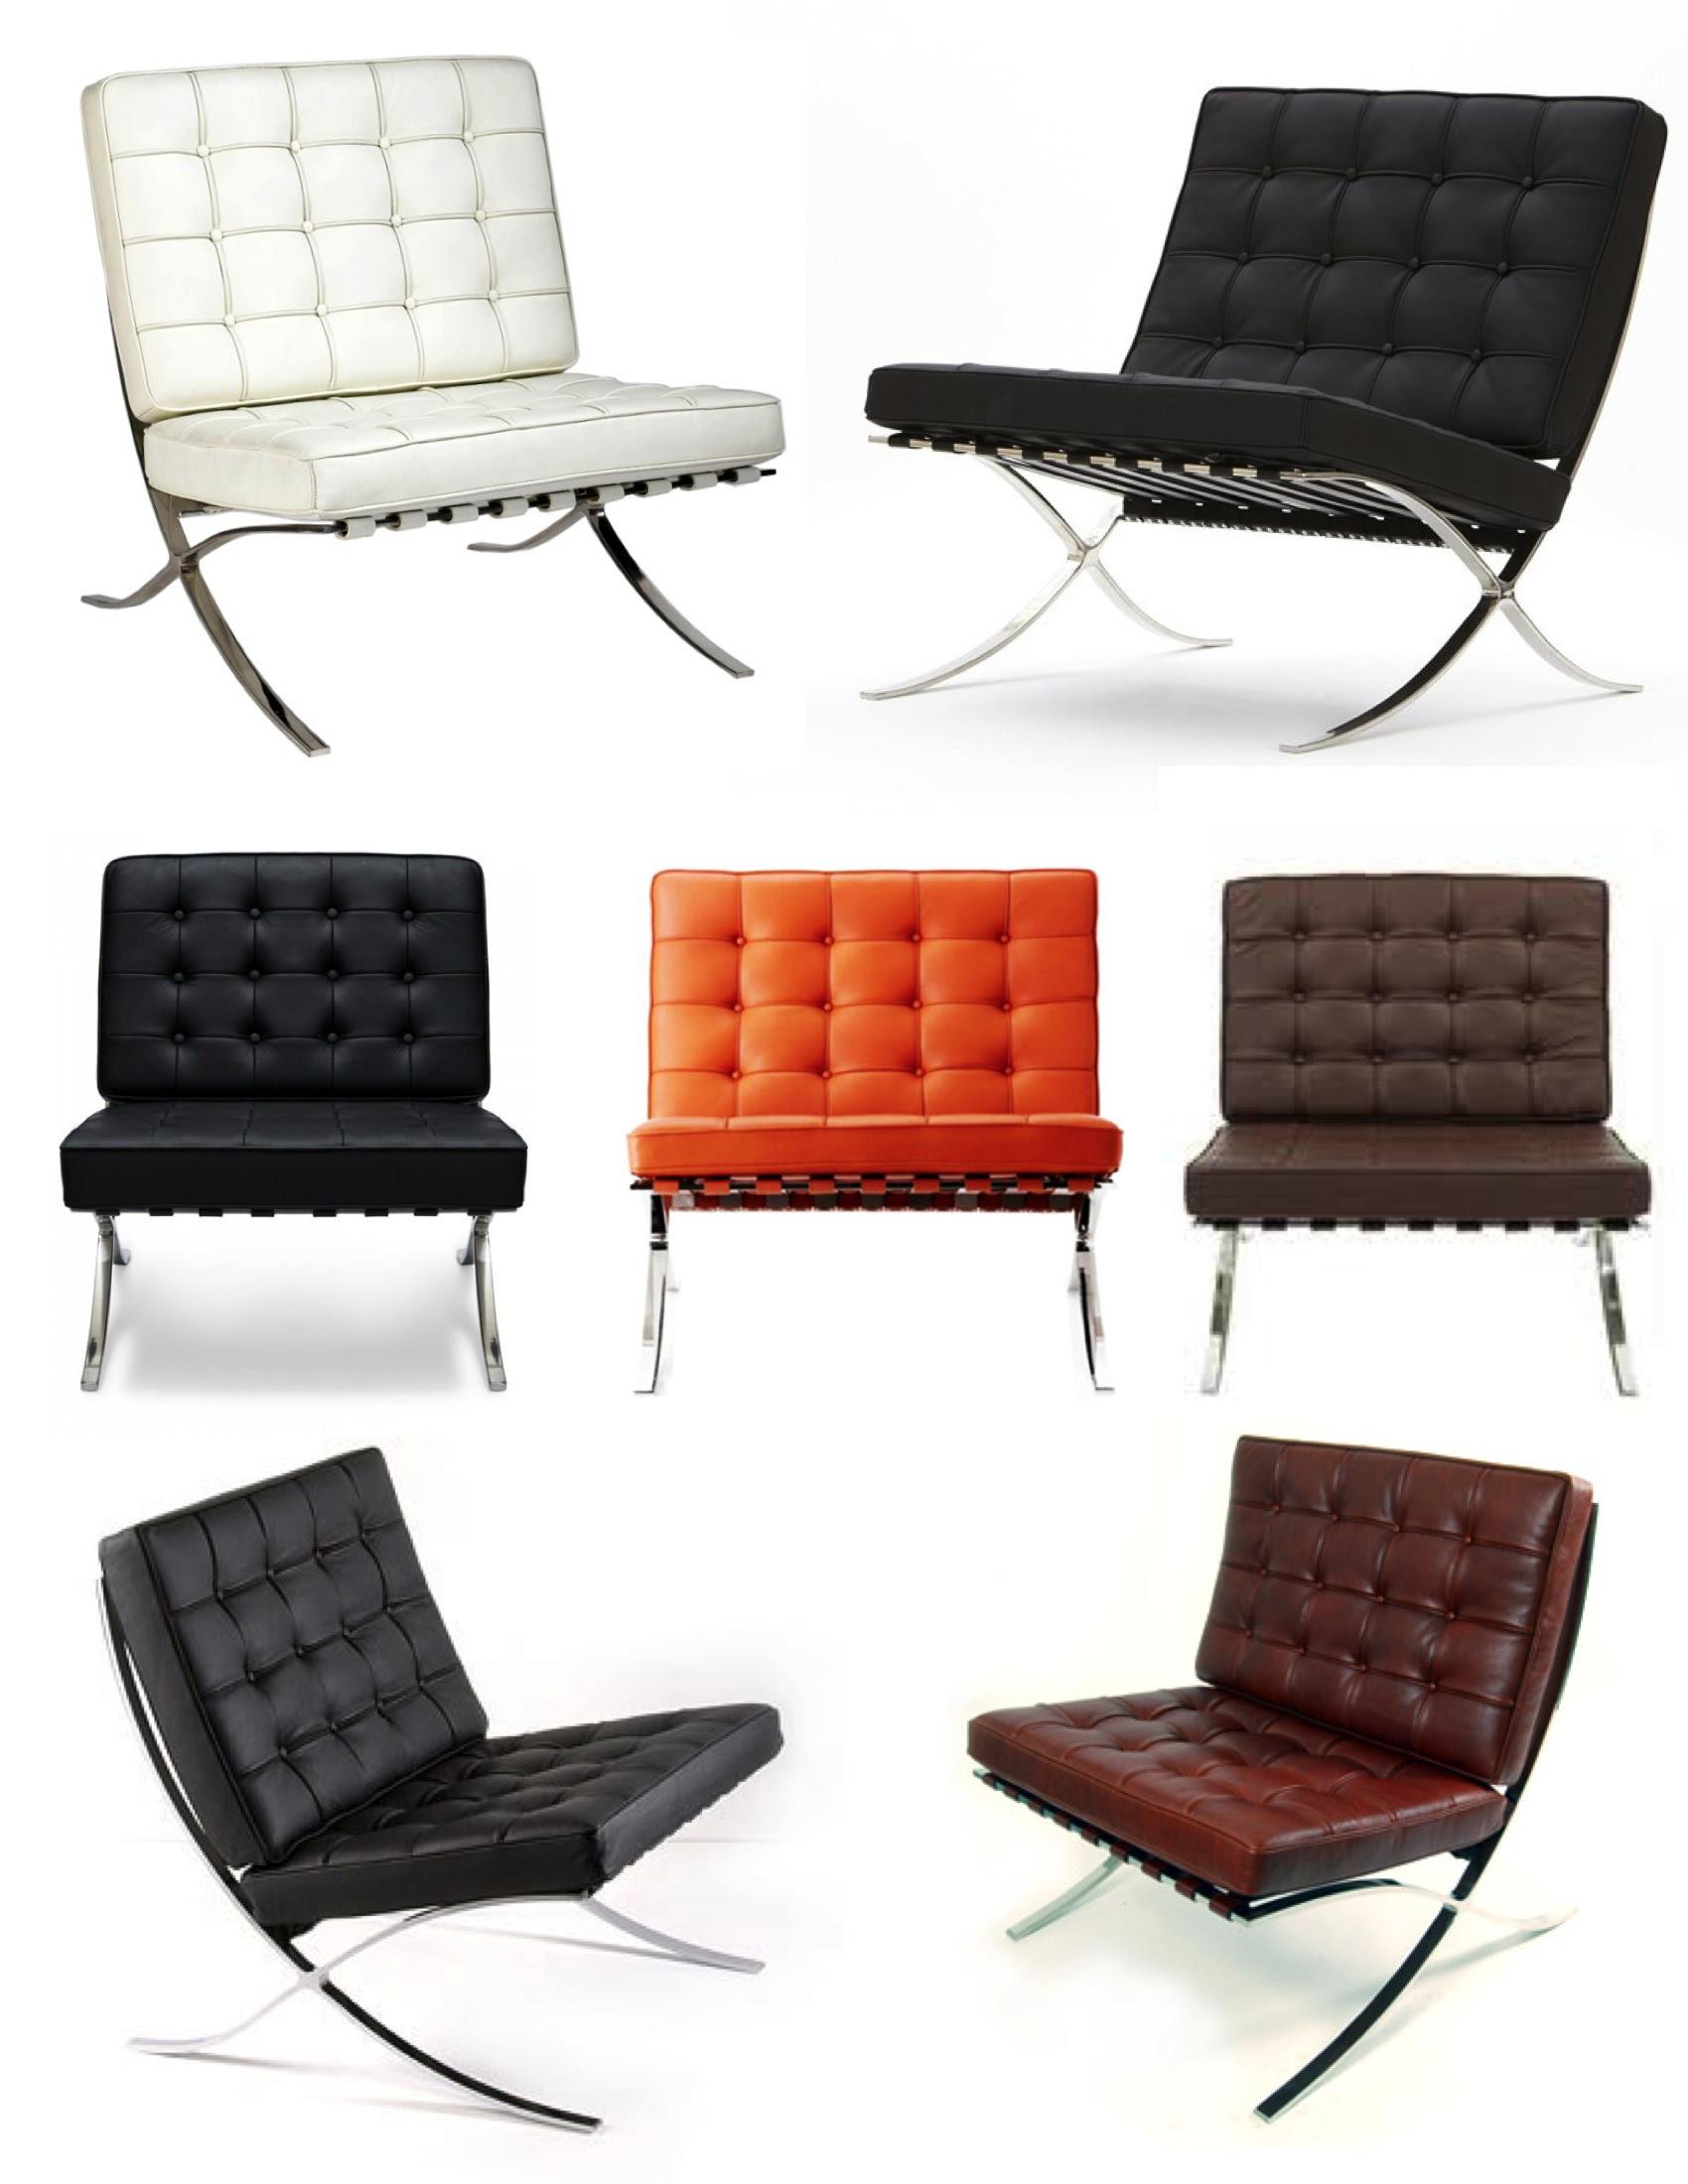 Barcelona Chair Dimensions - HomesFeed